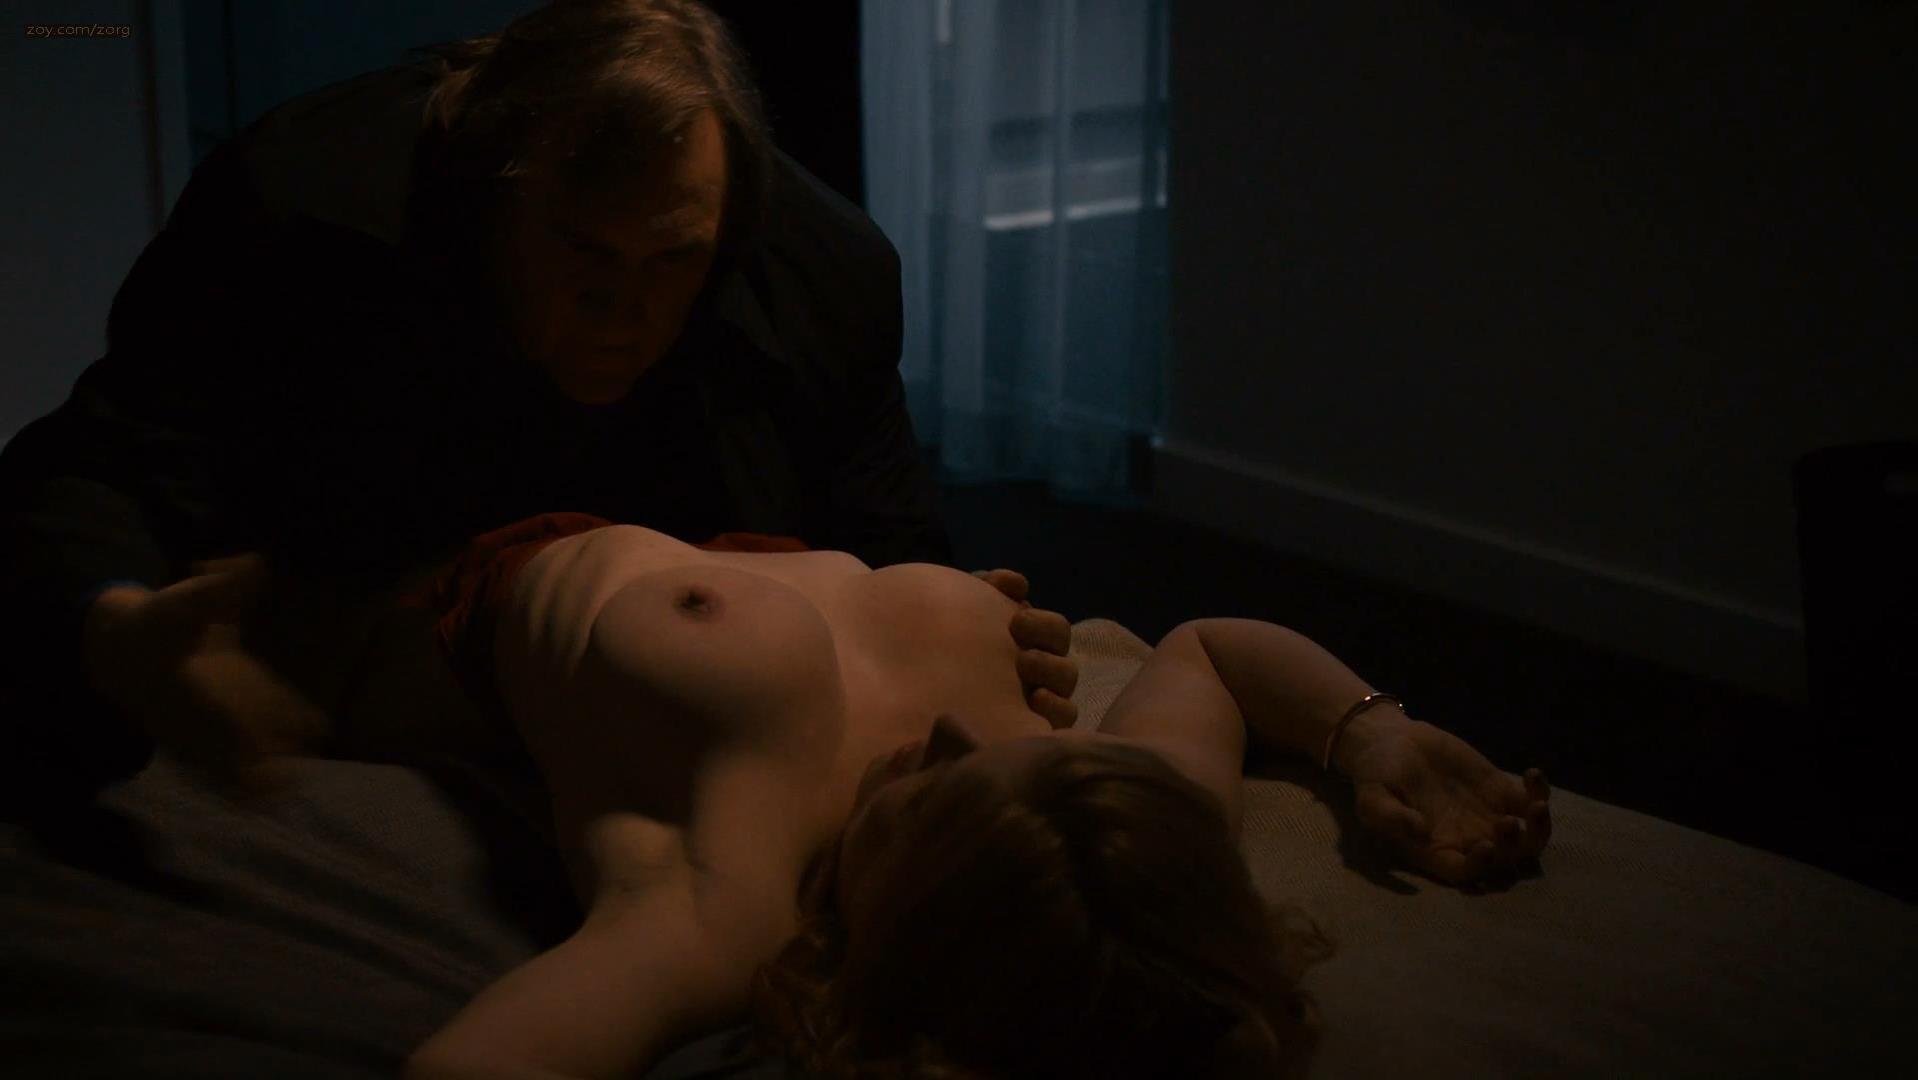 Emmanuelle Vill nude, Natasha Romanova nude, Shanyn Leigh nude - Welcome to New York (2014)